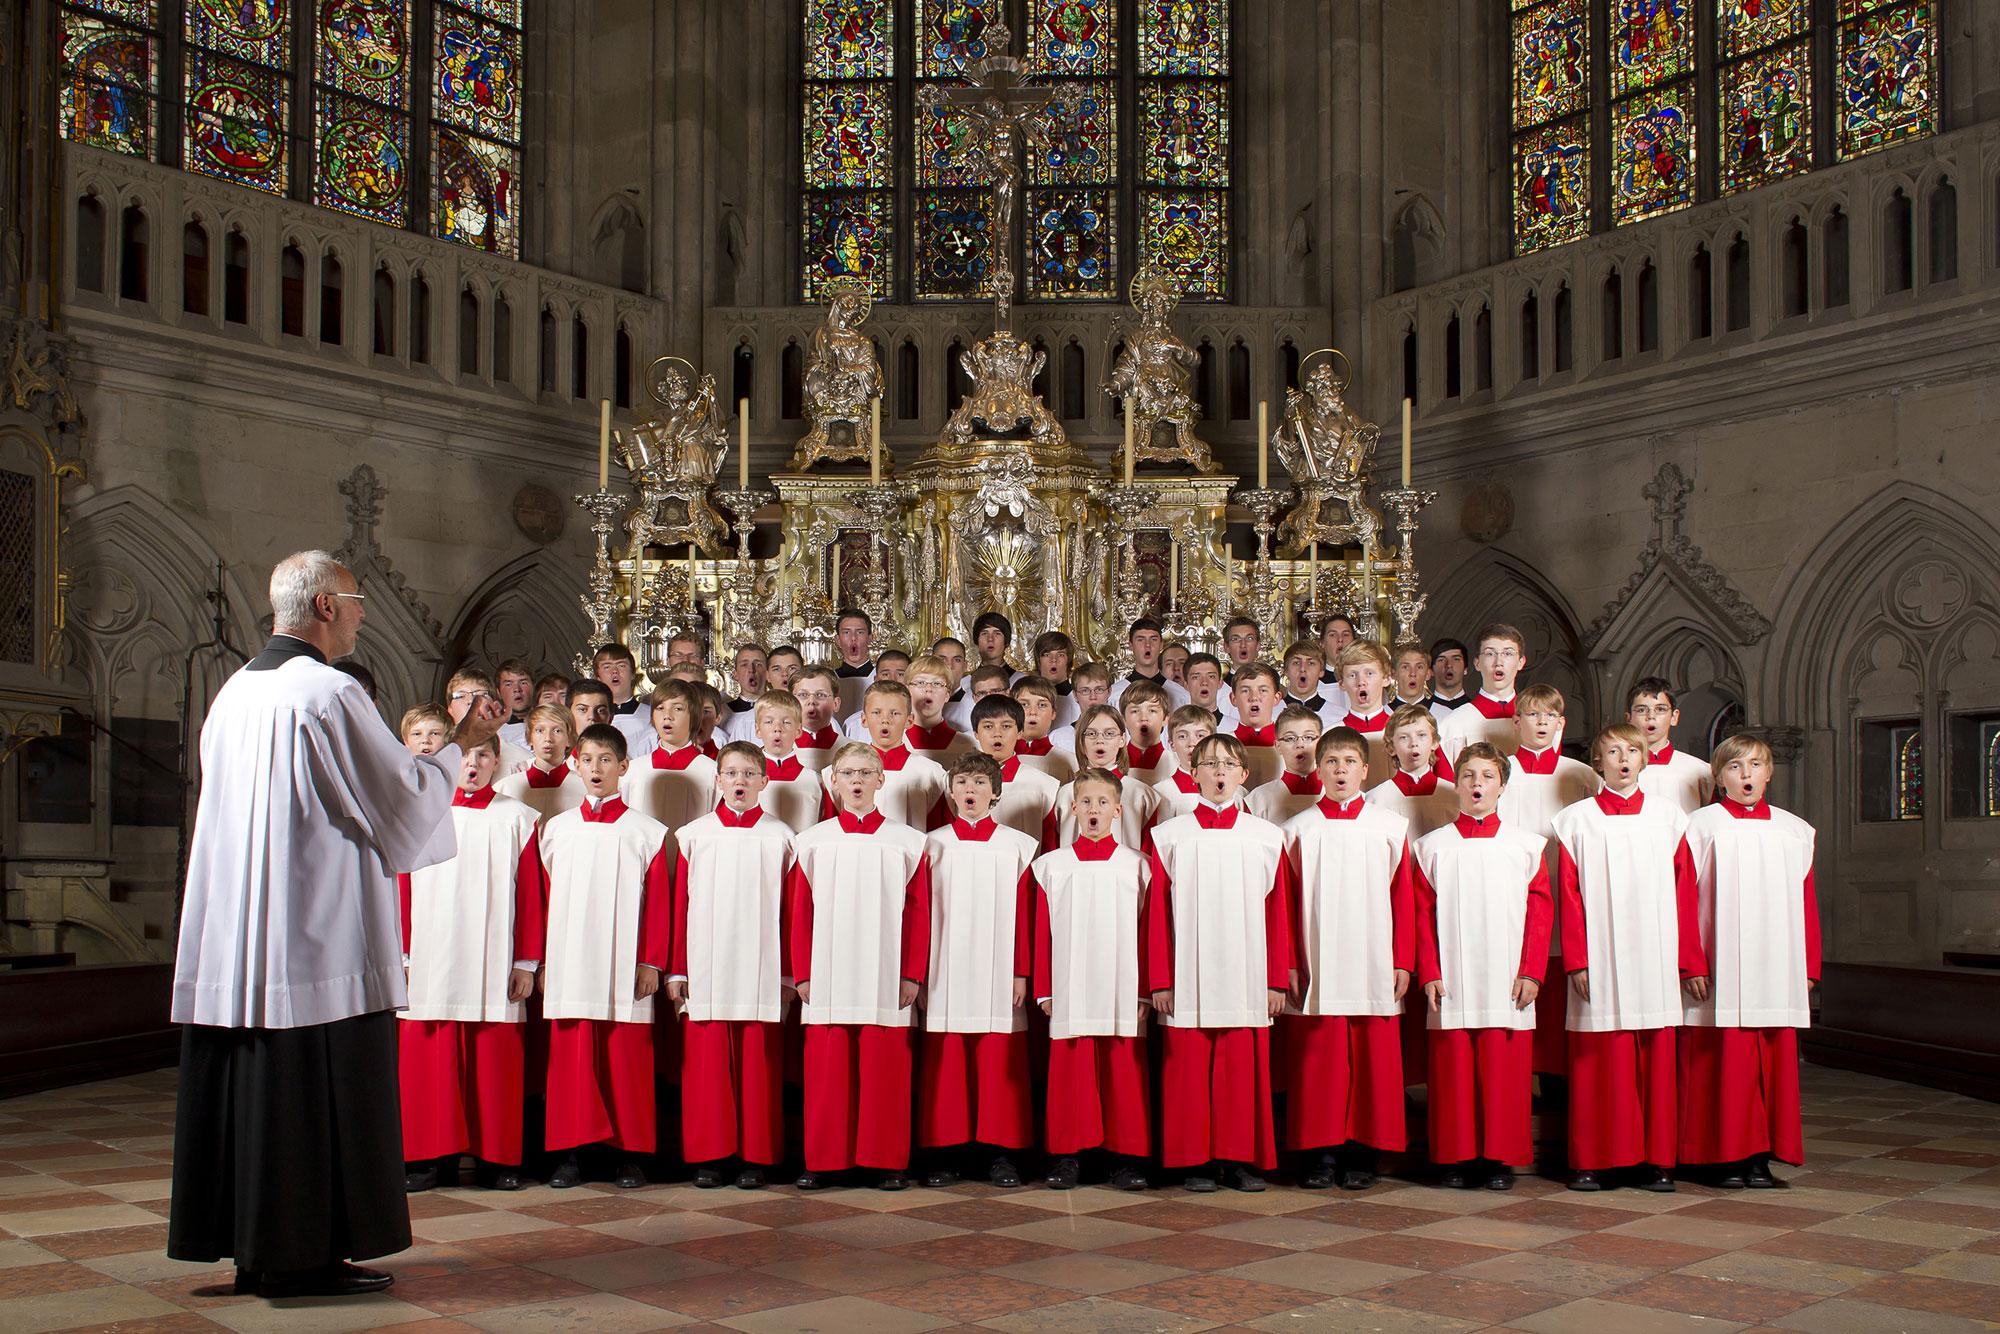 World-famous boys' choir: Regensburger Domspatzen